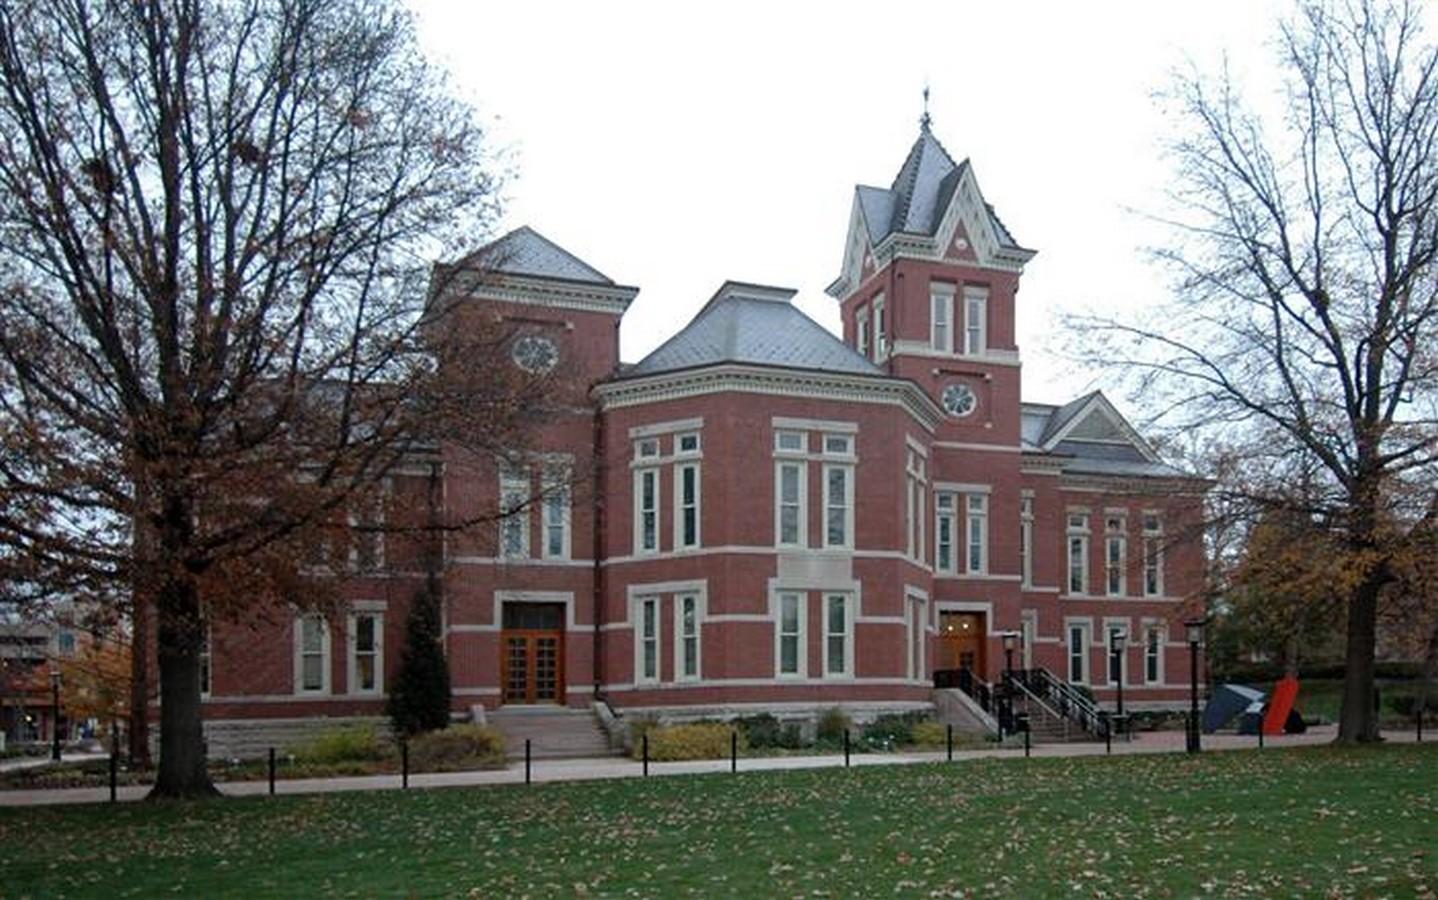 Architects in Kansas city - Top 90 Architects in Kansas city - Sheet11